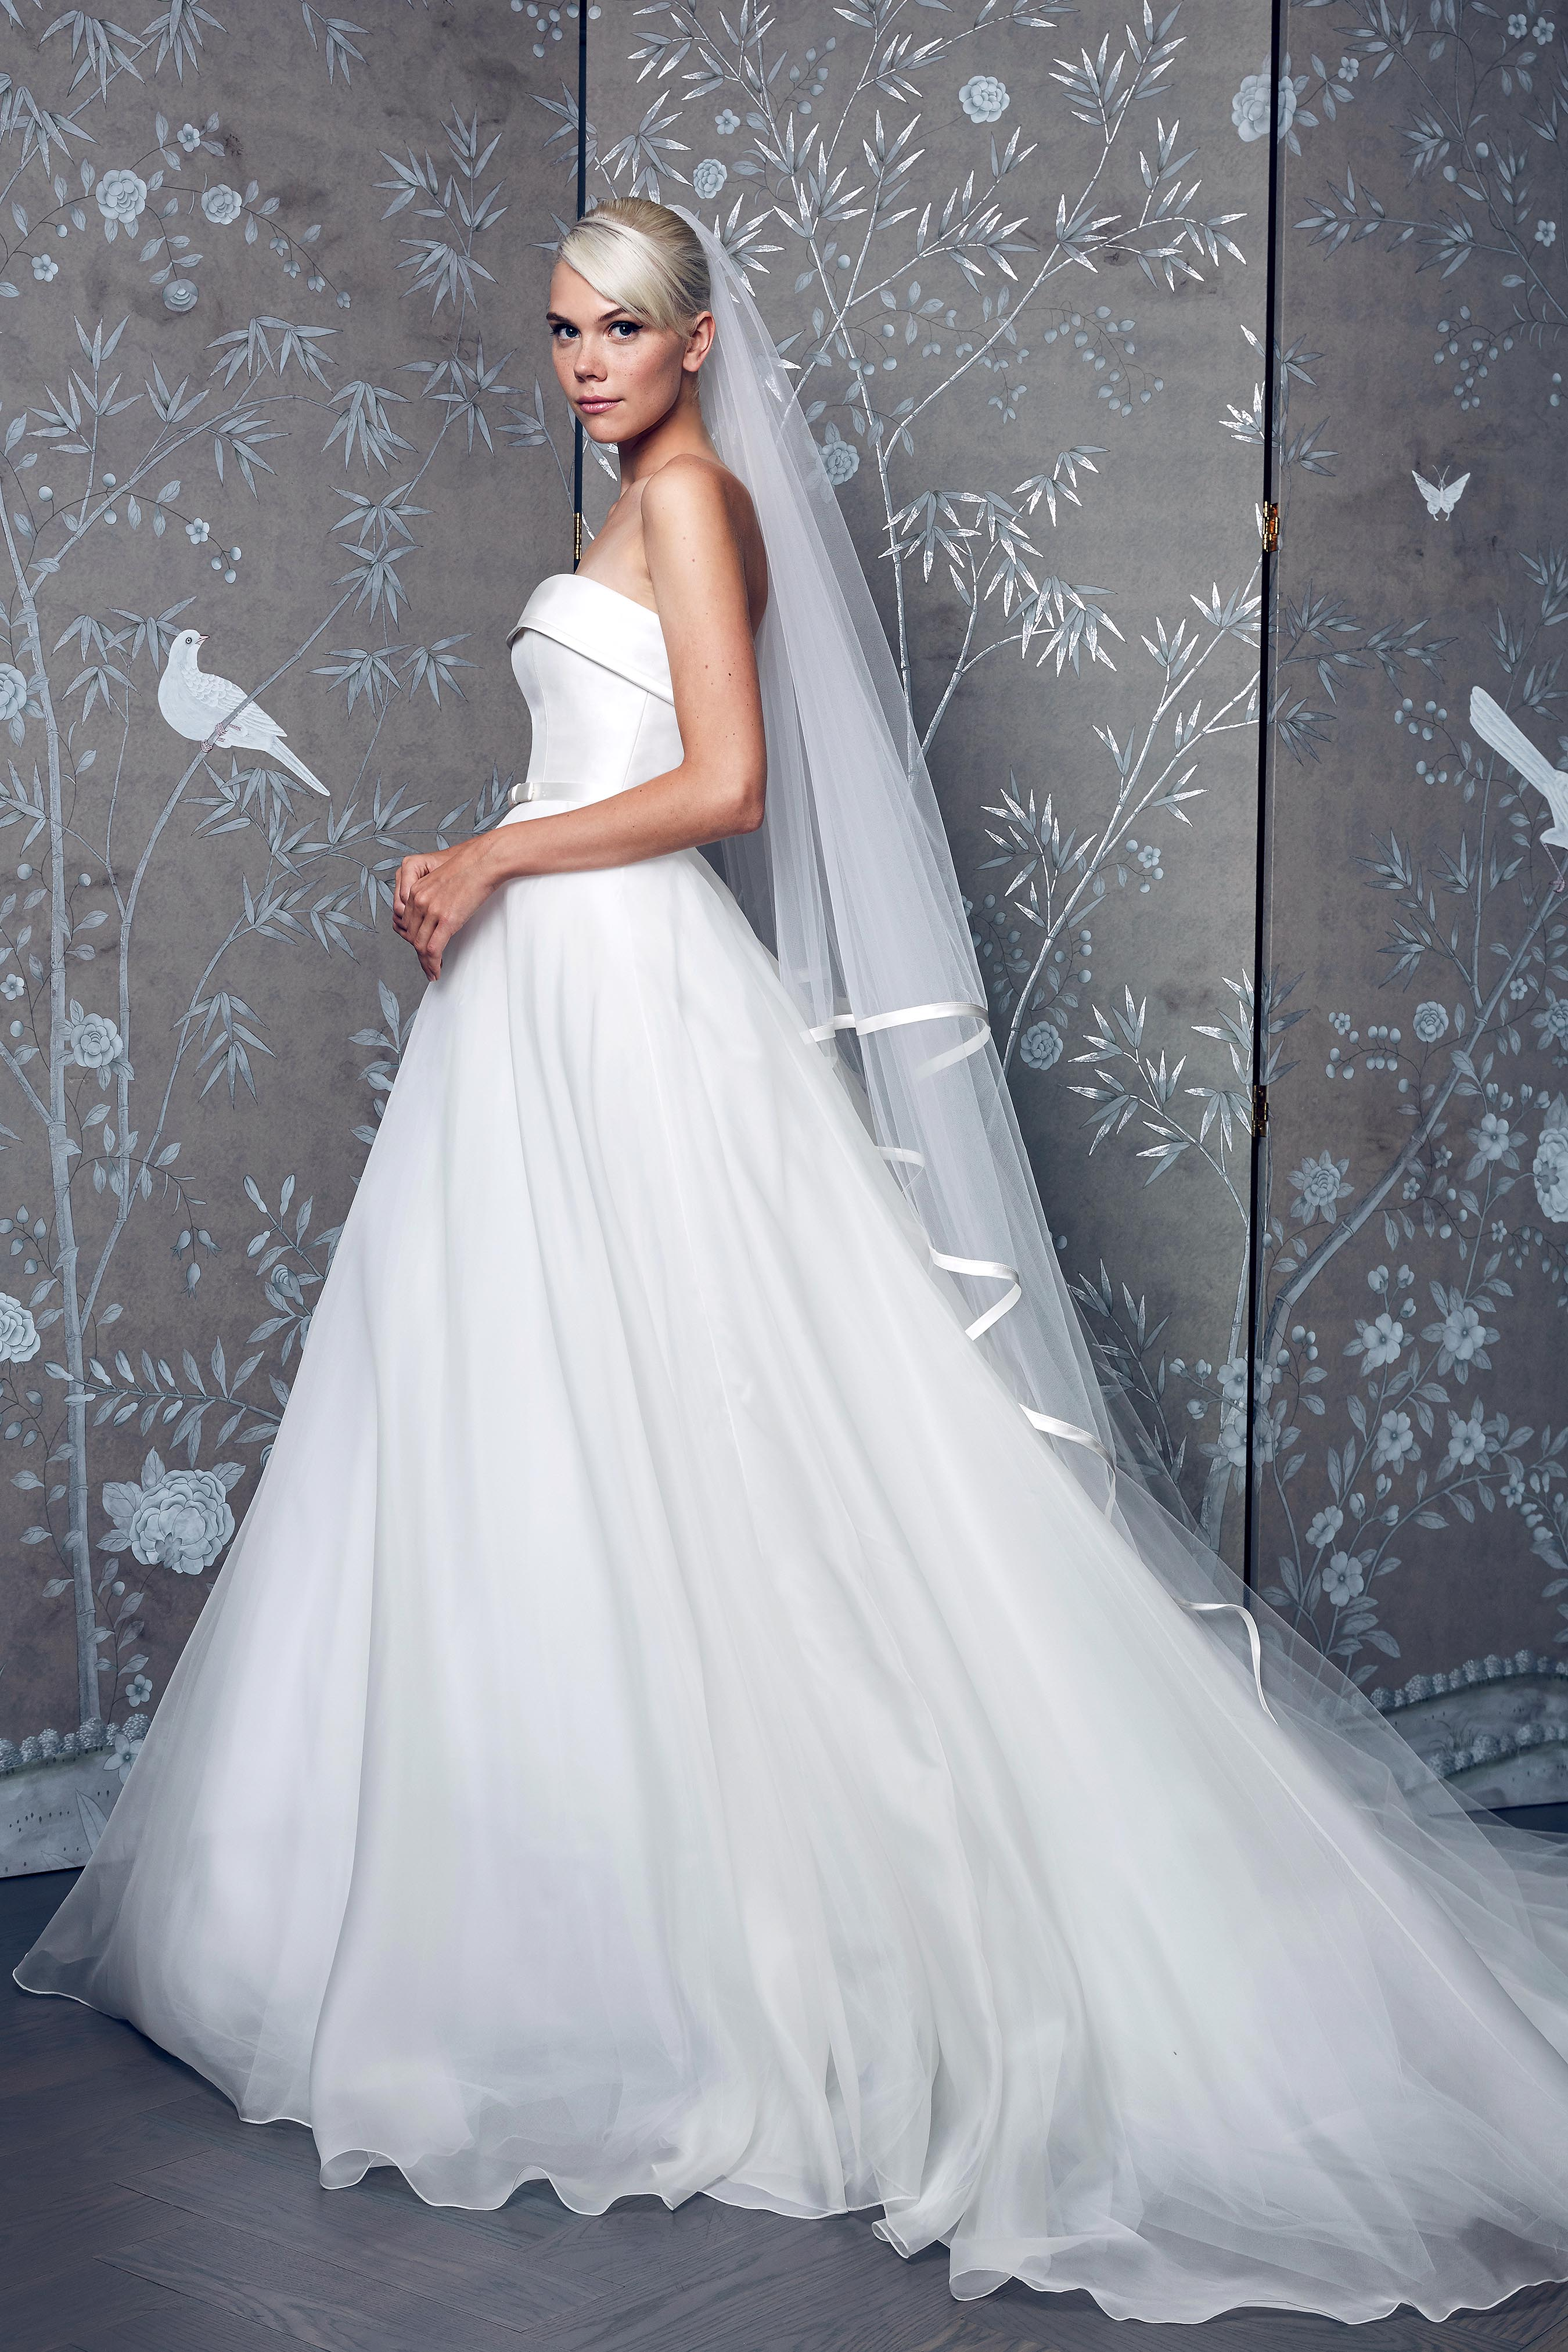 Legends Romona Keveza Halter with Veil Wedding Dress Fall 2018